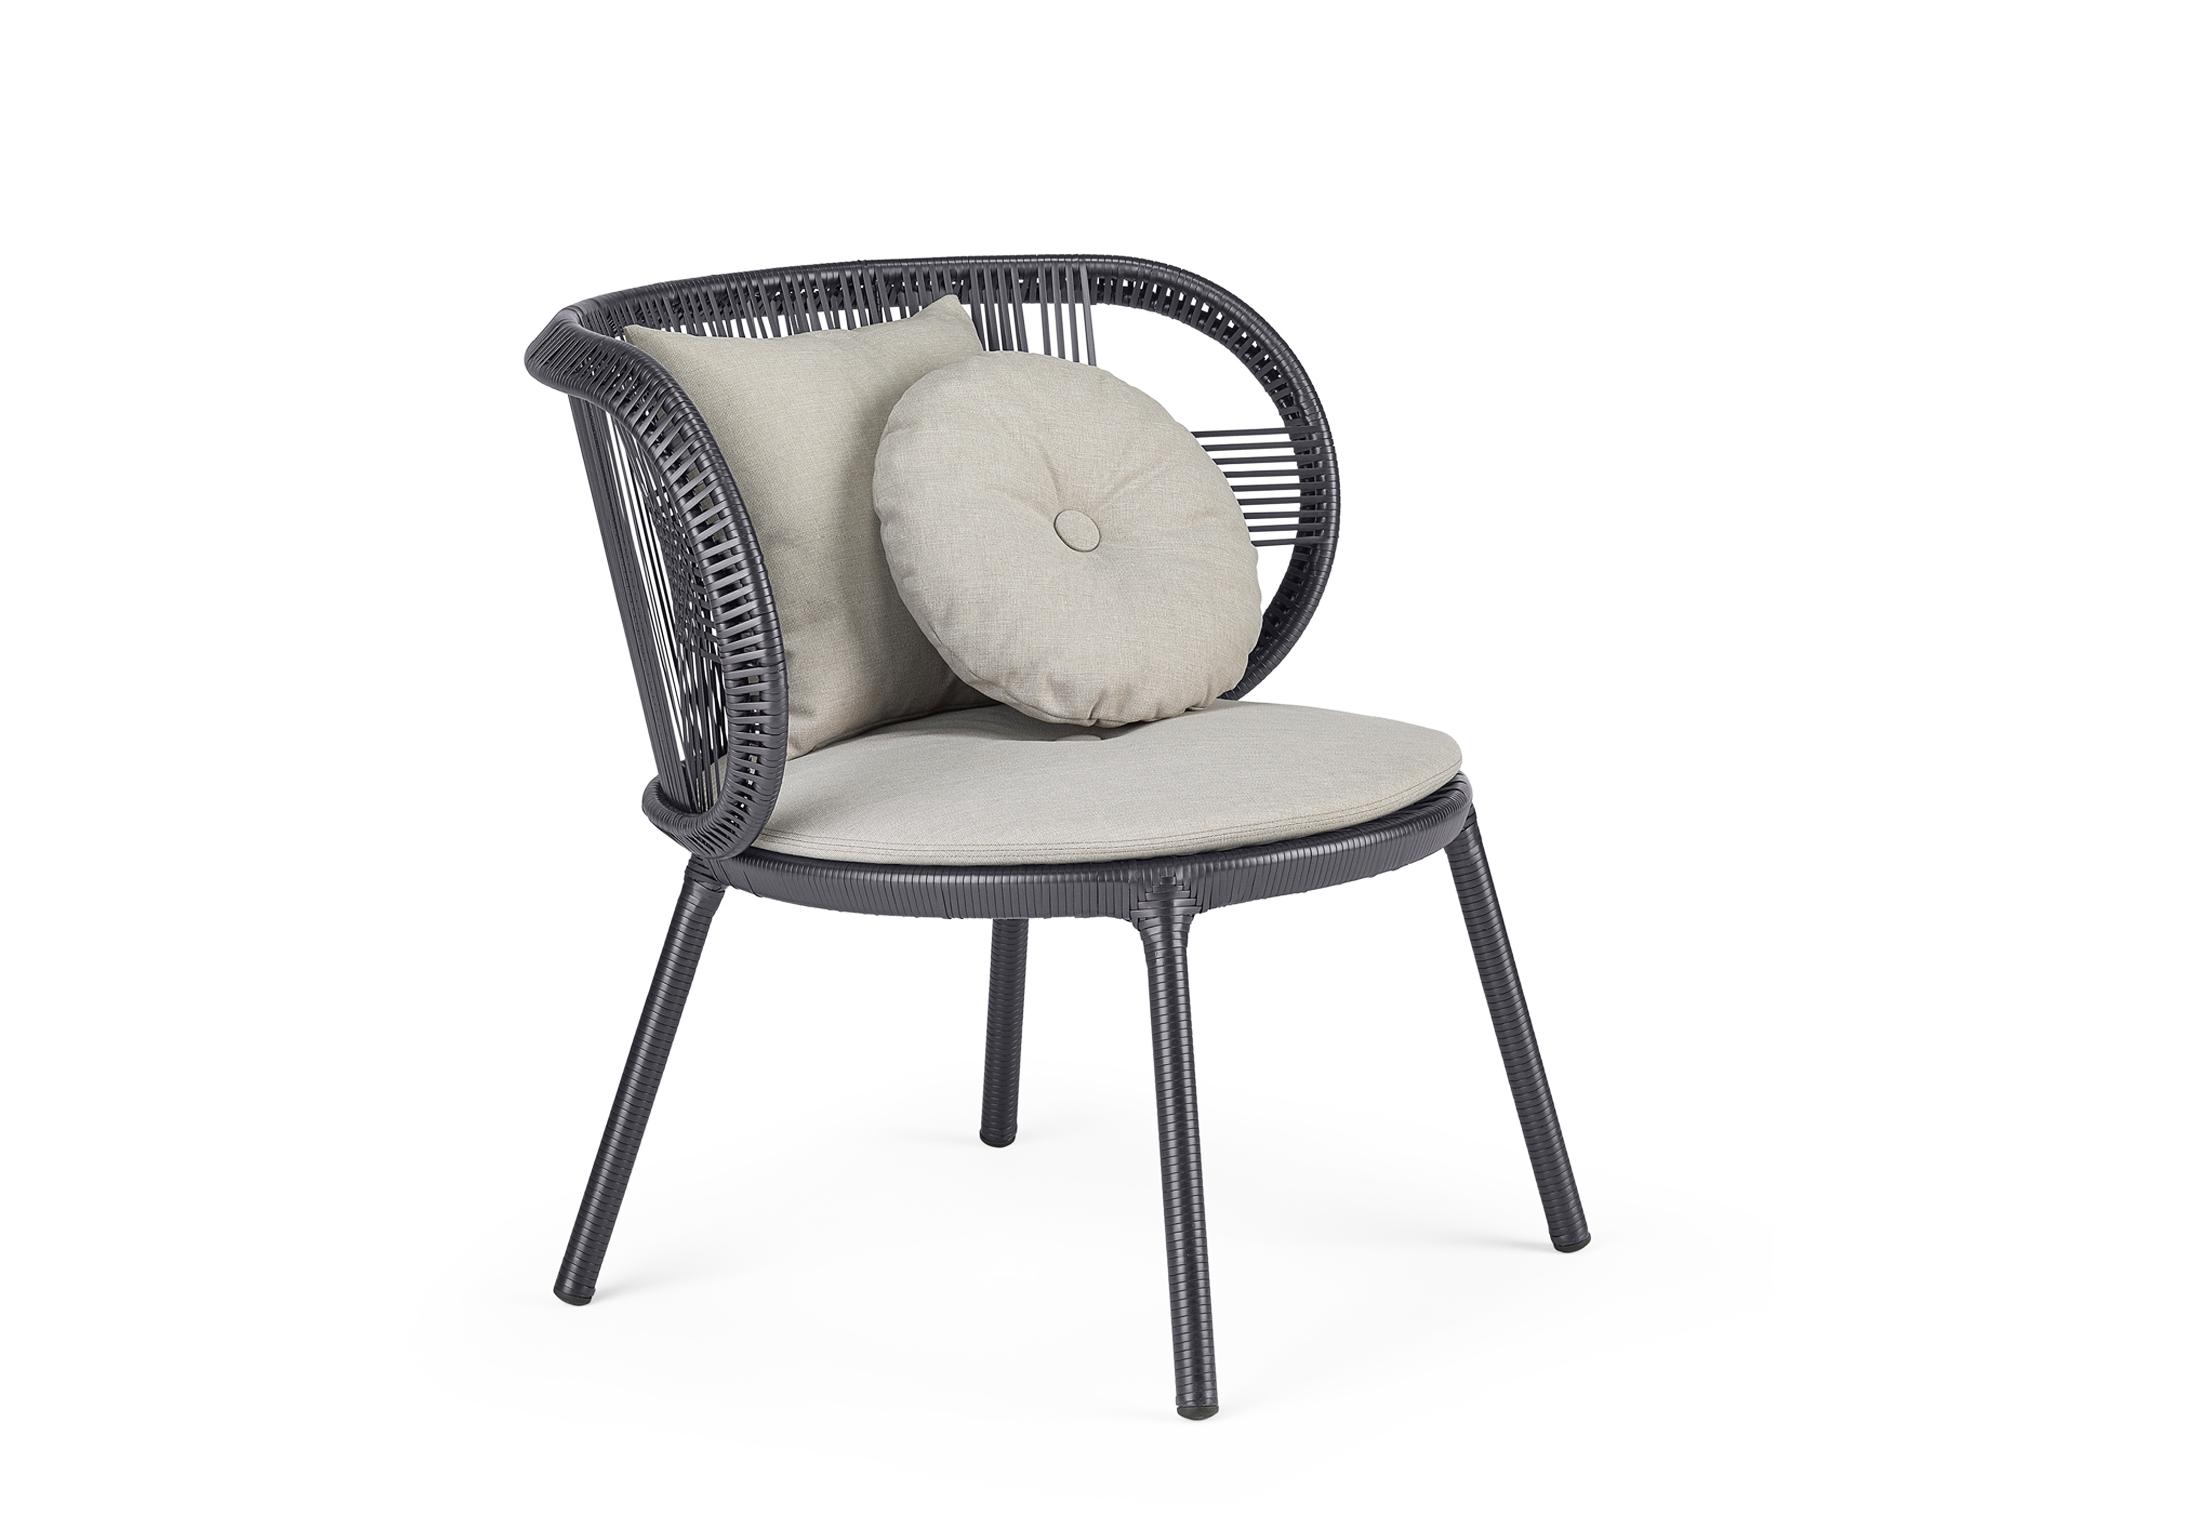 Surprising Cirql Lounge Chair By Dedon Stylepark Short Links Chair Design For Home Short Linksinfo